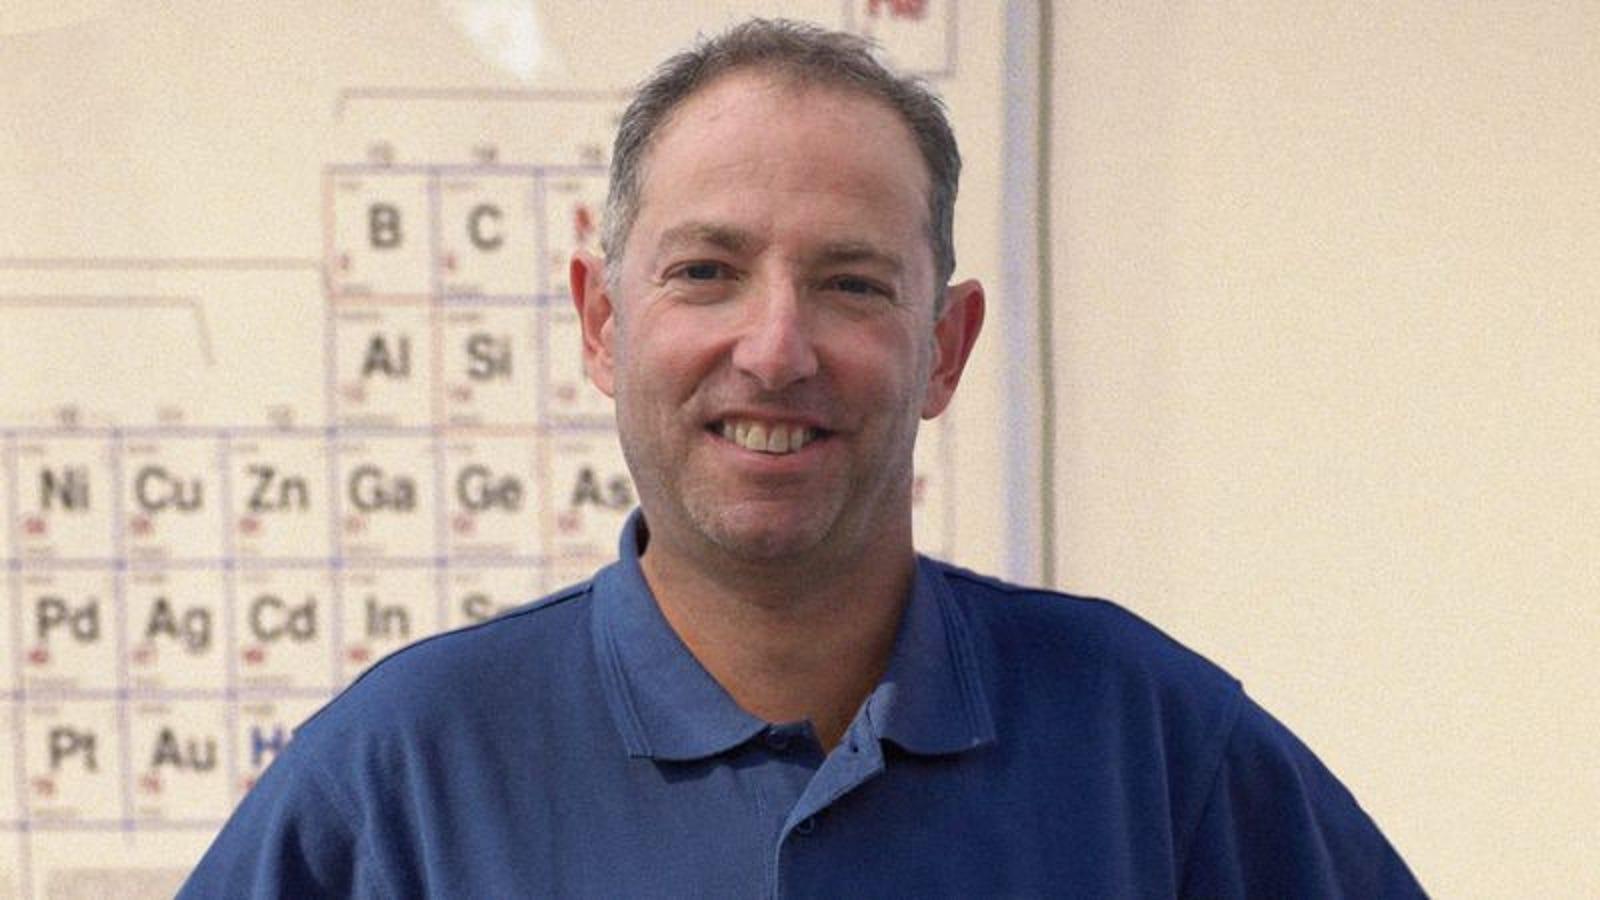 Nobel Prize In Chemistry Awarded To Taft Middle School Teacher Mr. Ambler